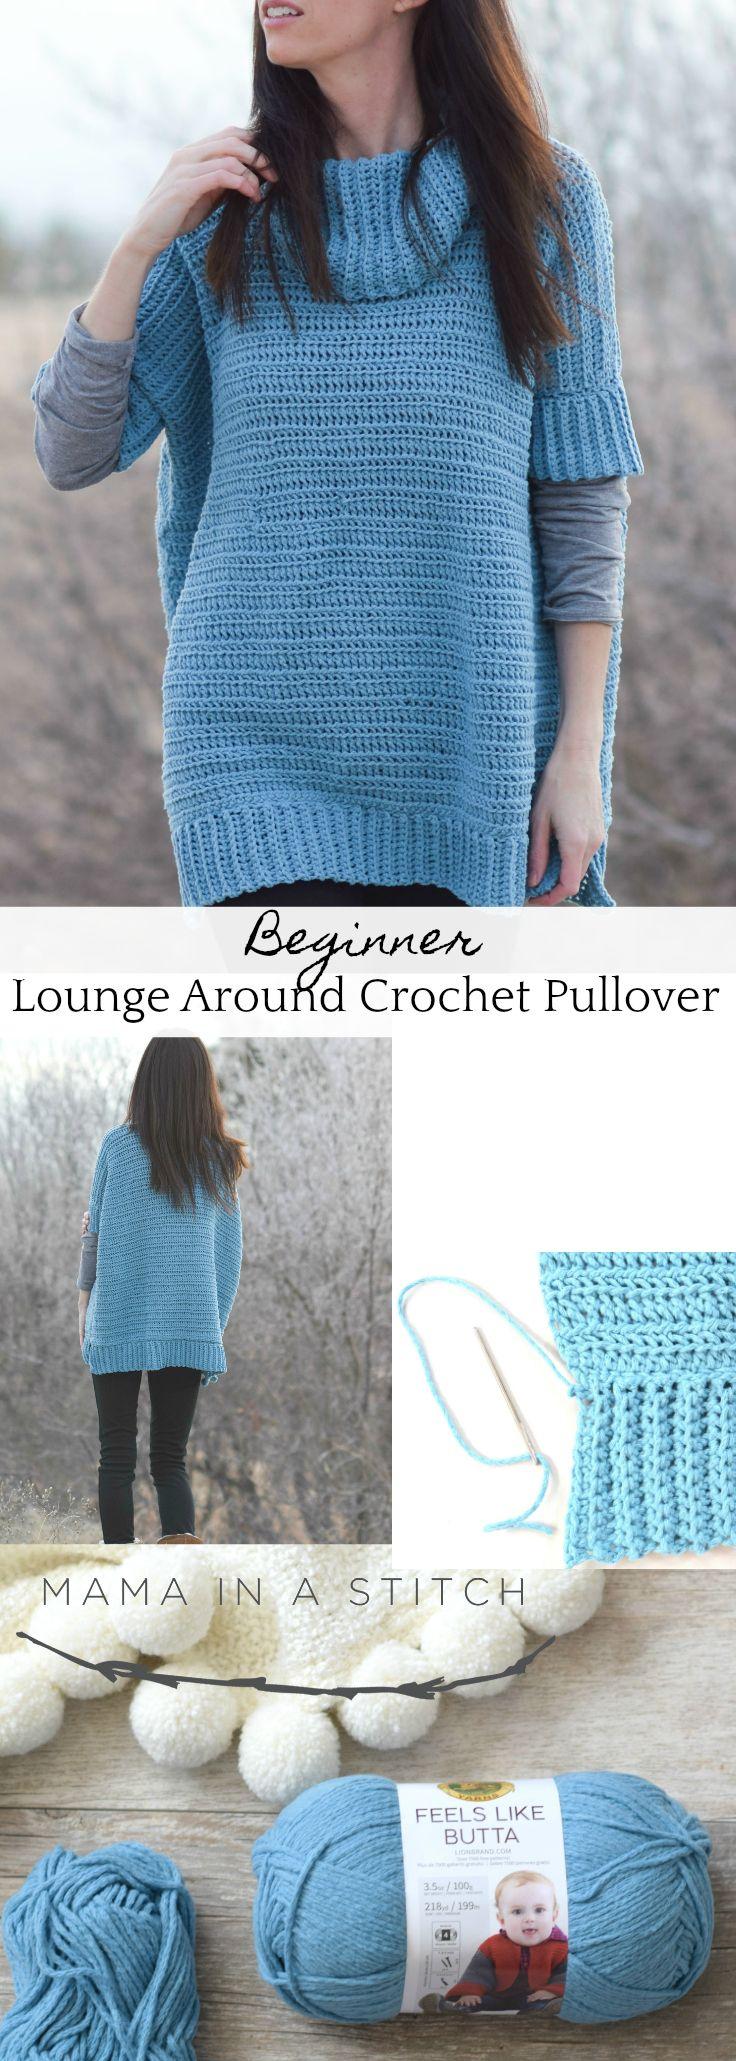 Softest Lounge Around Pullover Crochet Pattern | Pinterest | Crochet ...